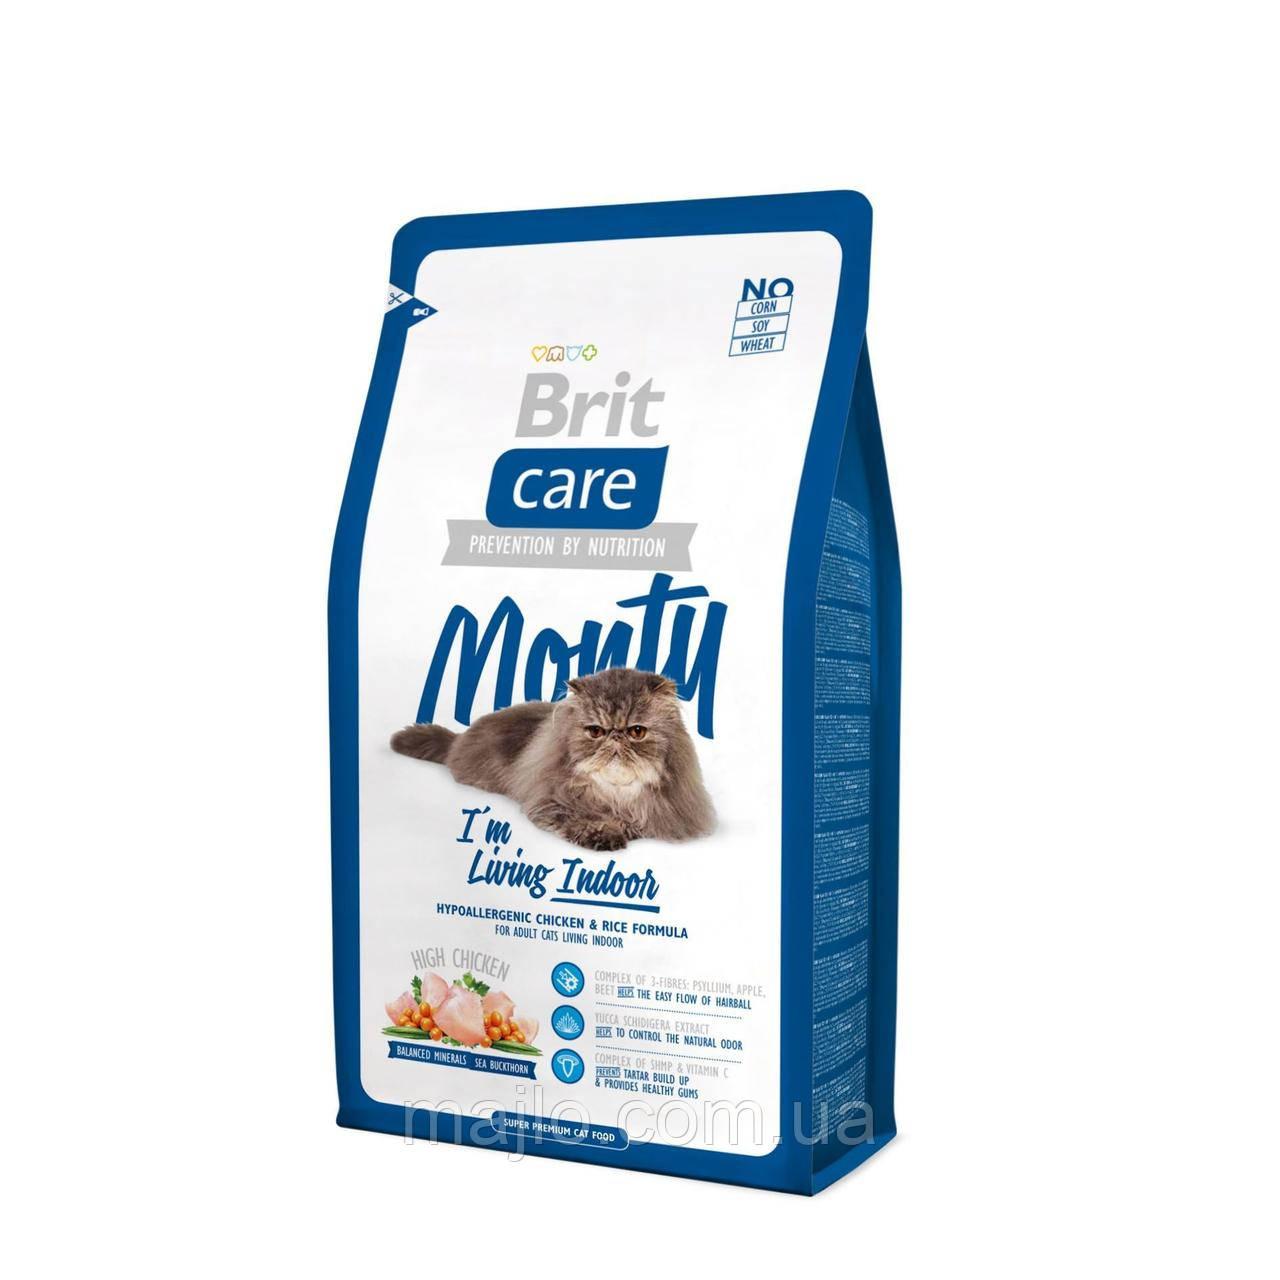 Сухий корм Brit Care Cat Monty Indoor Брит Кеа для домашніх кішок, 400 р, 132611